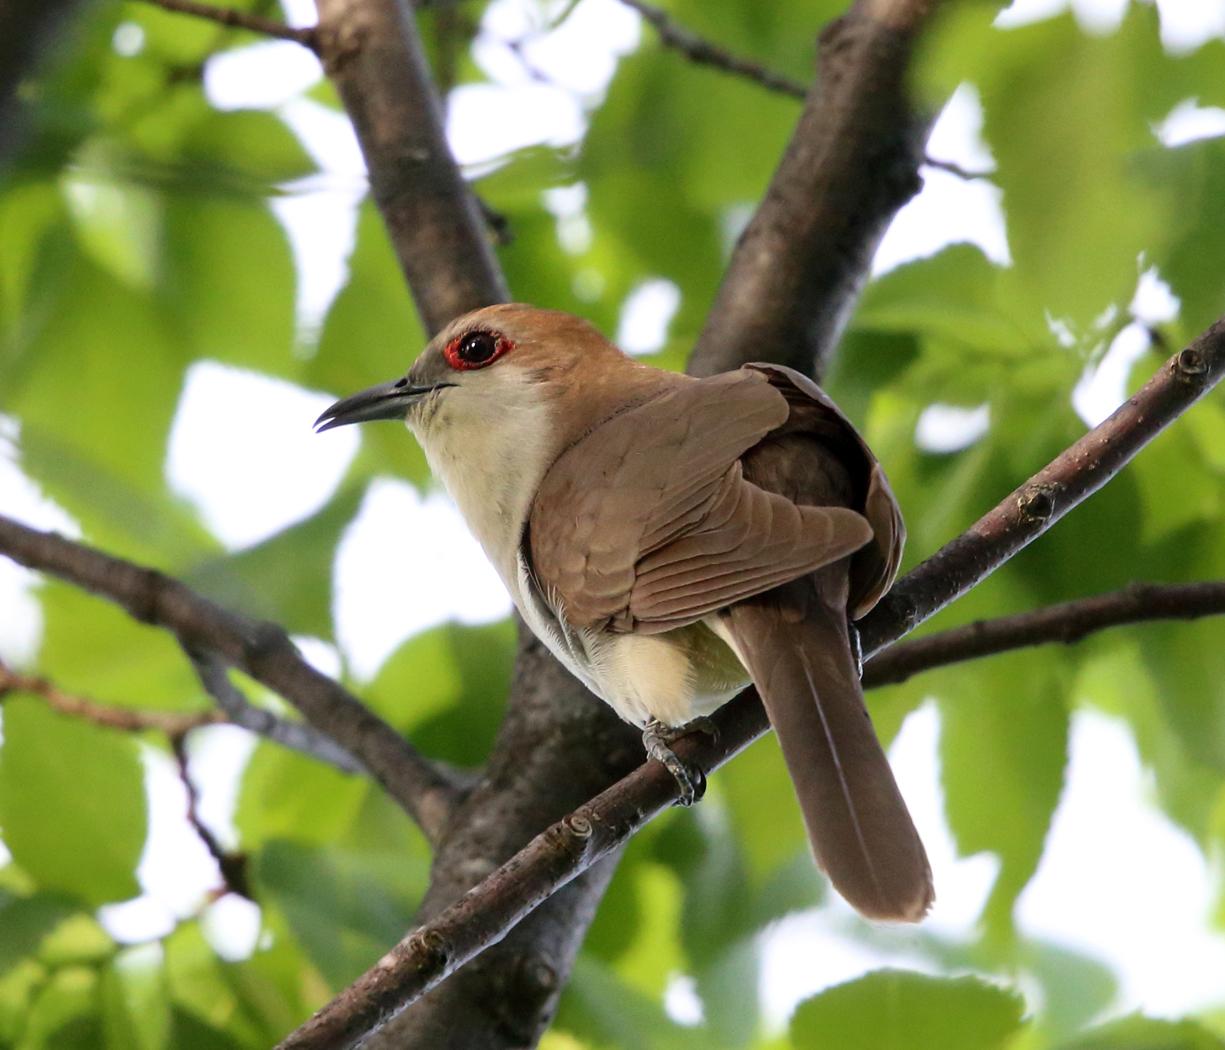 Black-billed cuckoo. Photo by Tom Murray